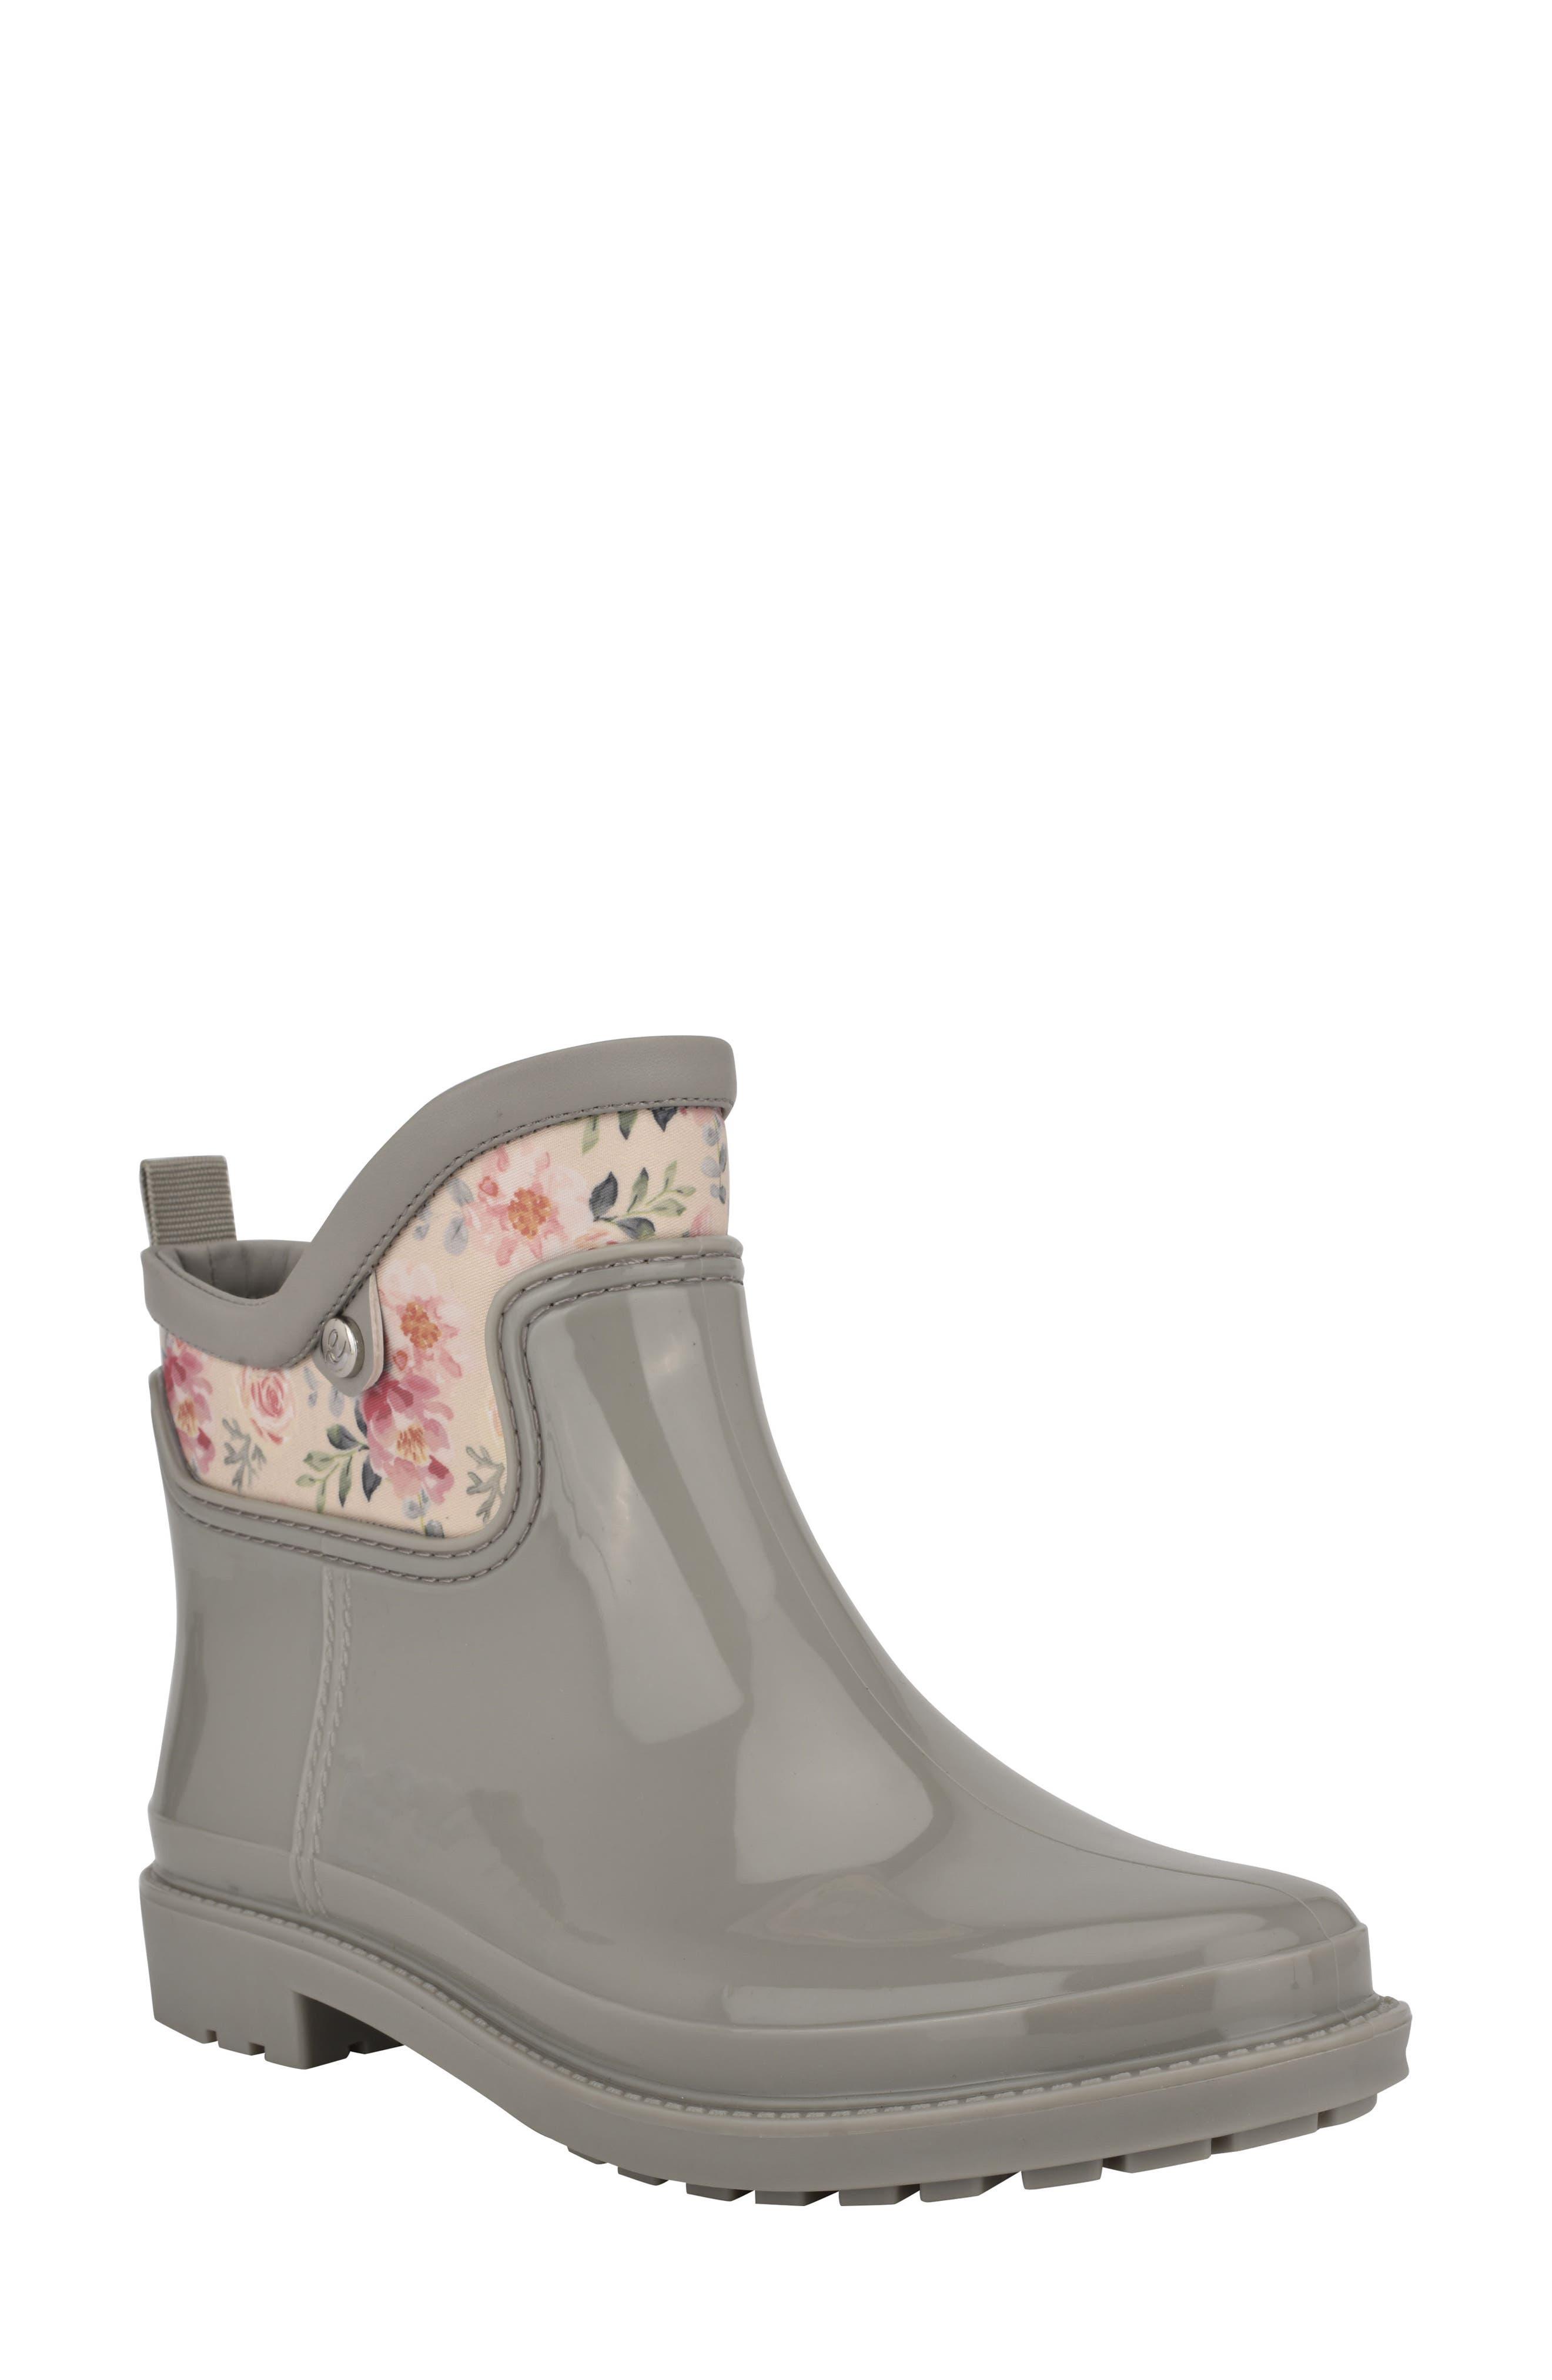 X Martha Stewart Sprinkle Rain Boot